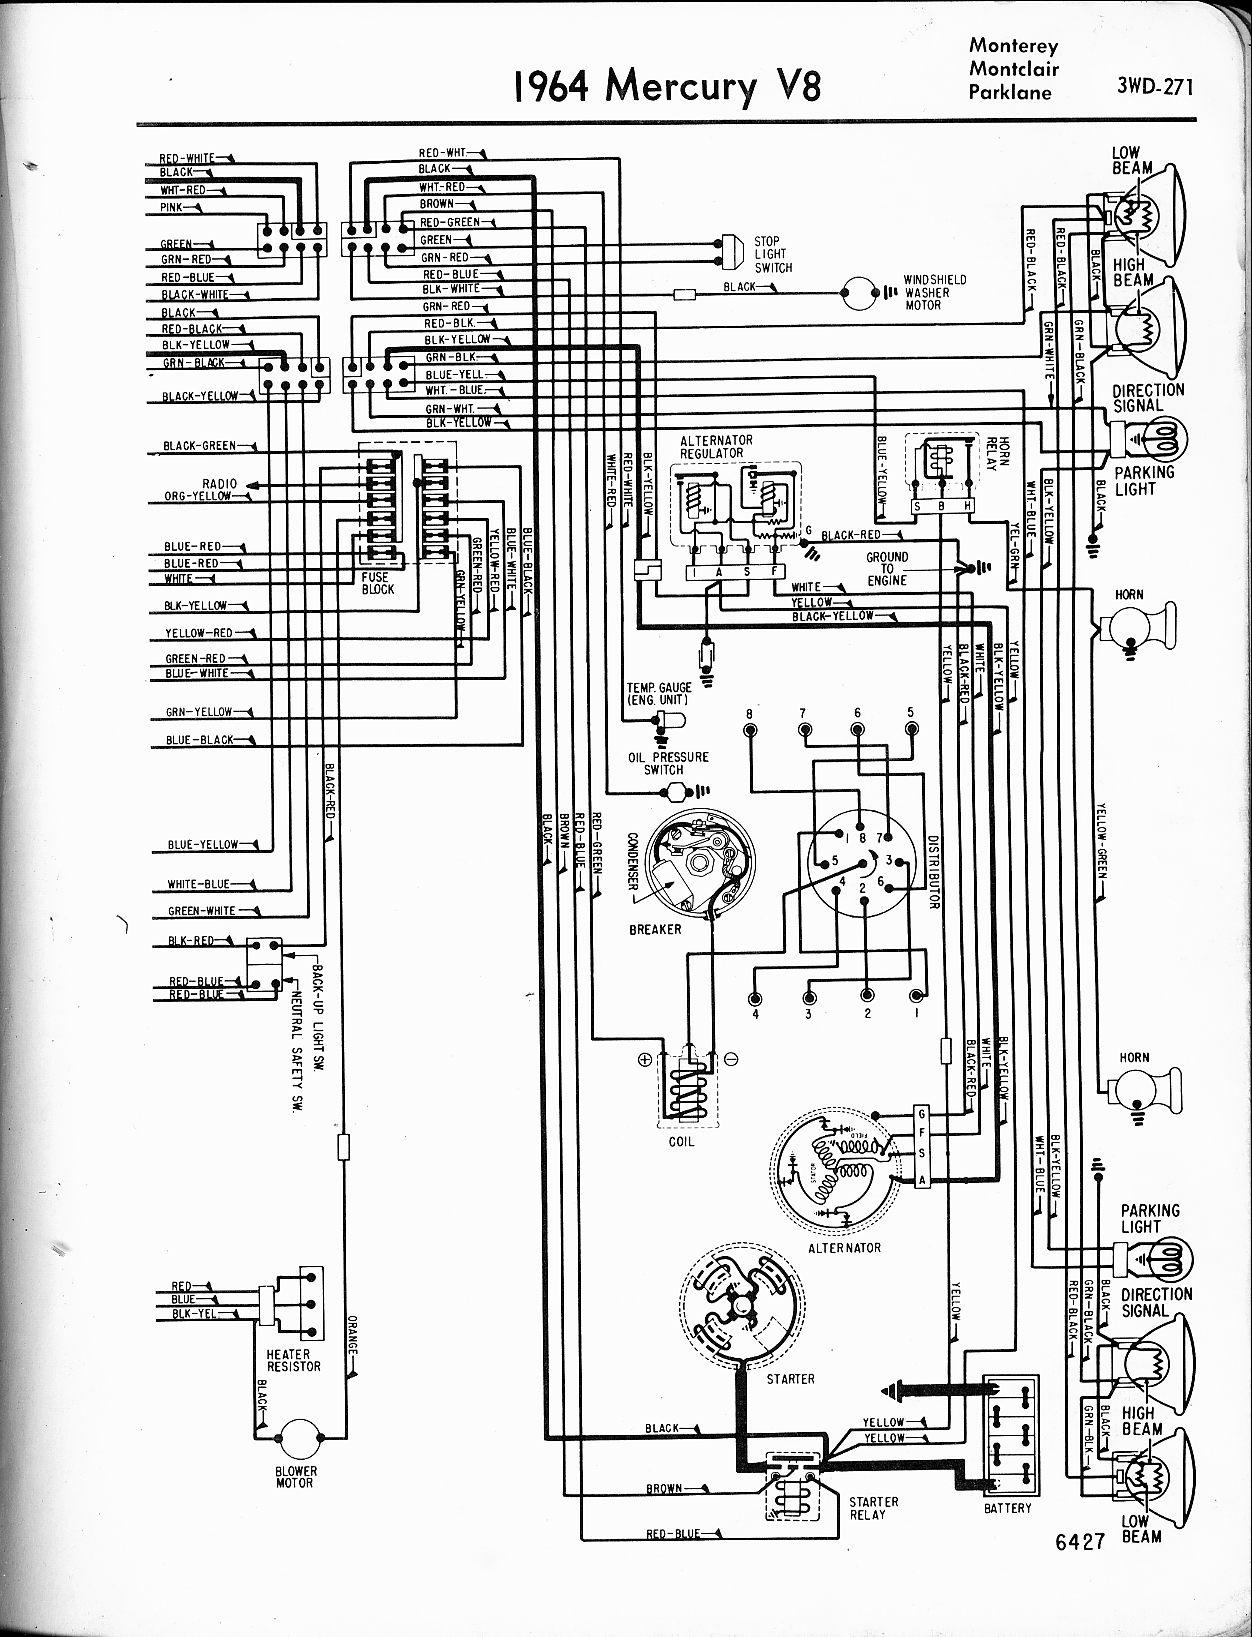 Sensational 1964 Ford Ranchero Fuse Box Diagram Wiring Diagram Data Schema Wiring Cloud Rometaidewilluminateatxorg